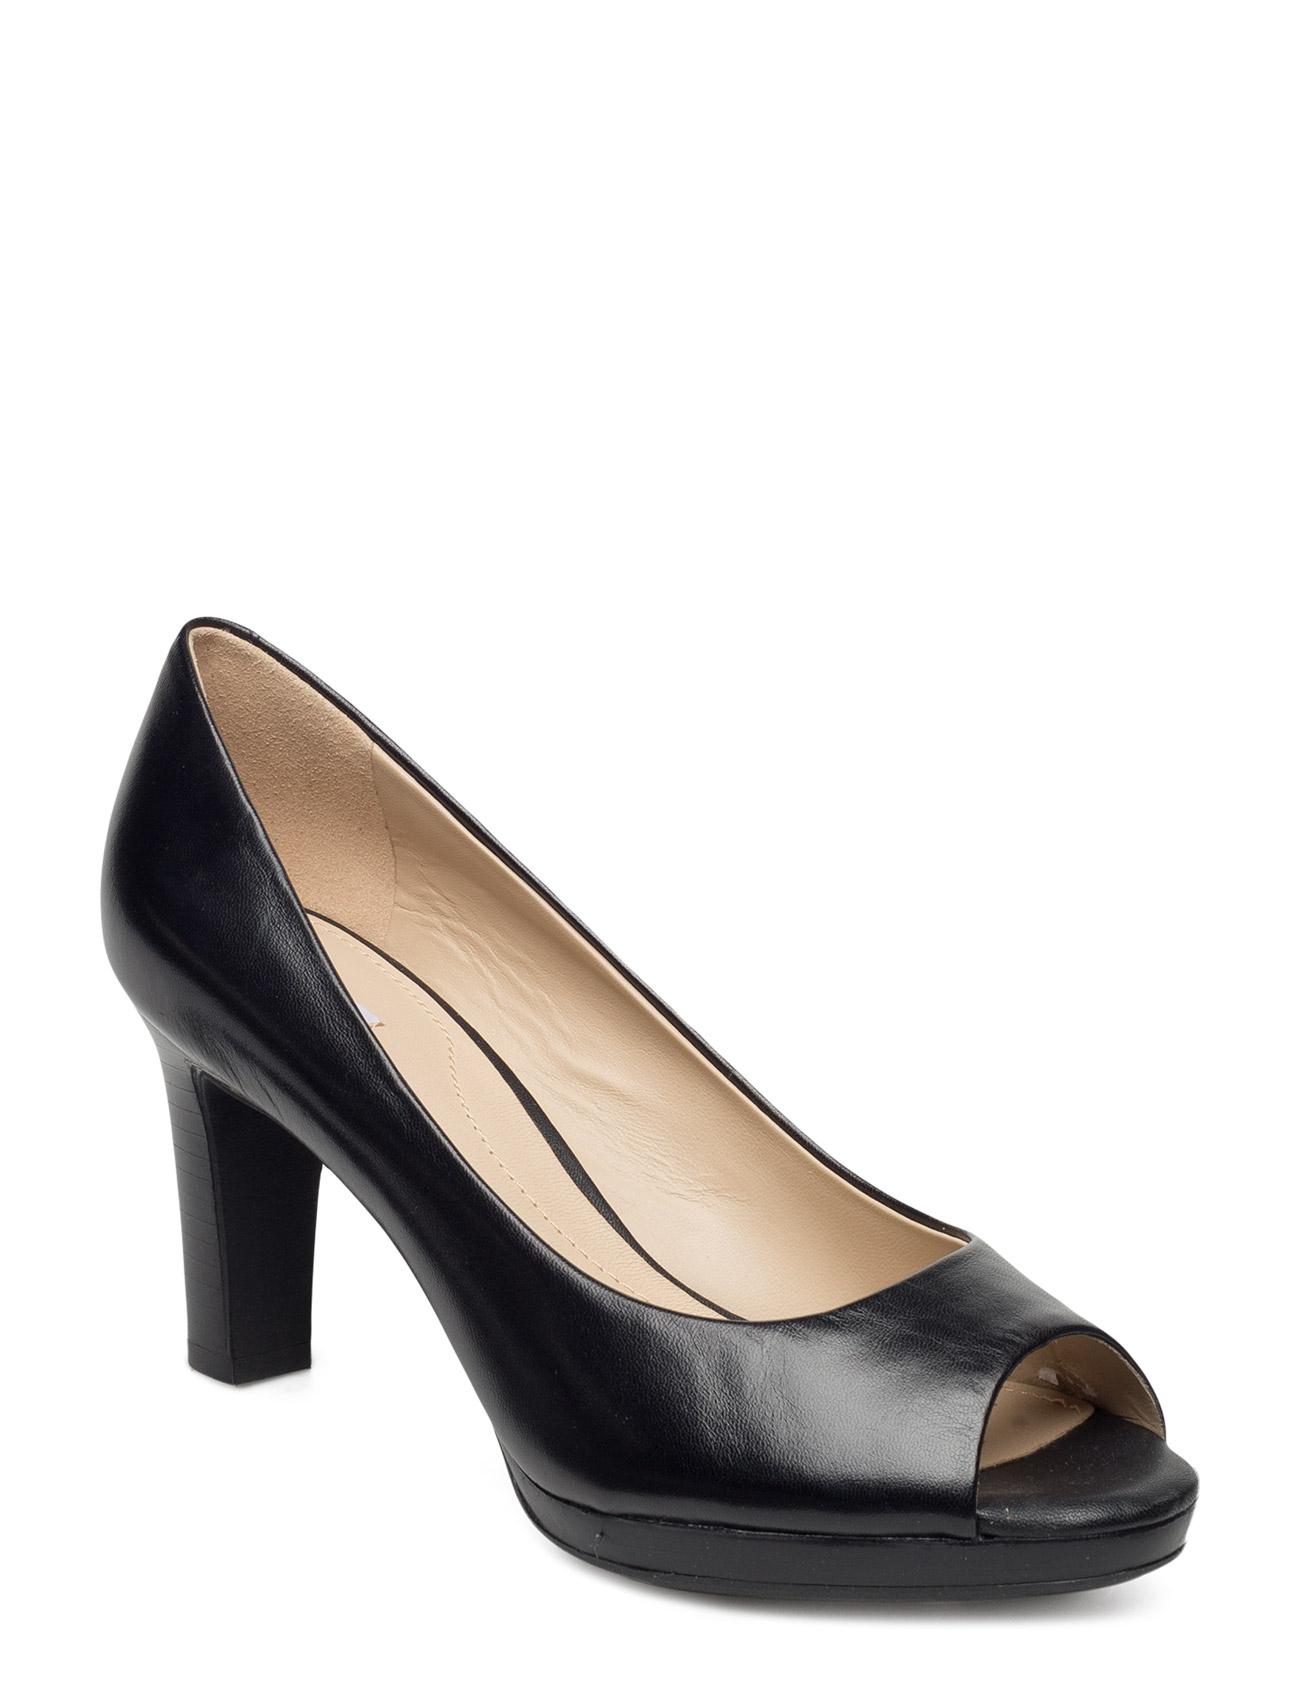 D Lana GEOX Stiletter til Kvinder i Black Oxford